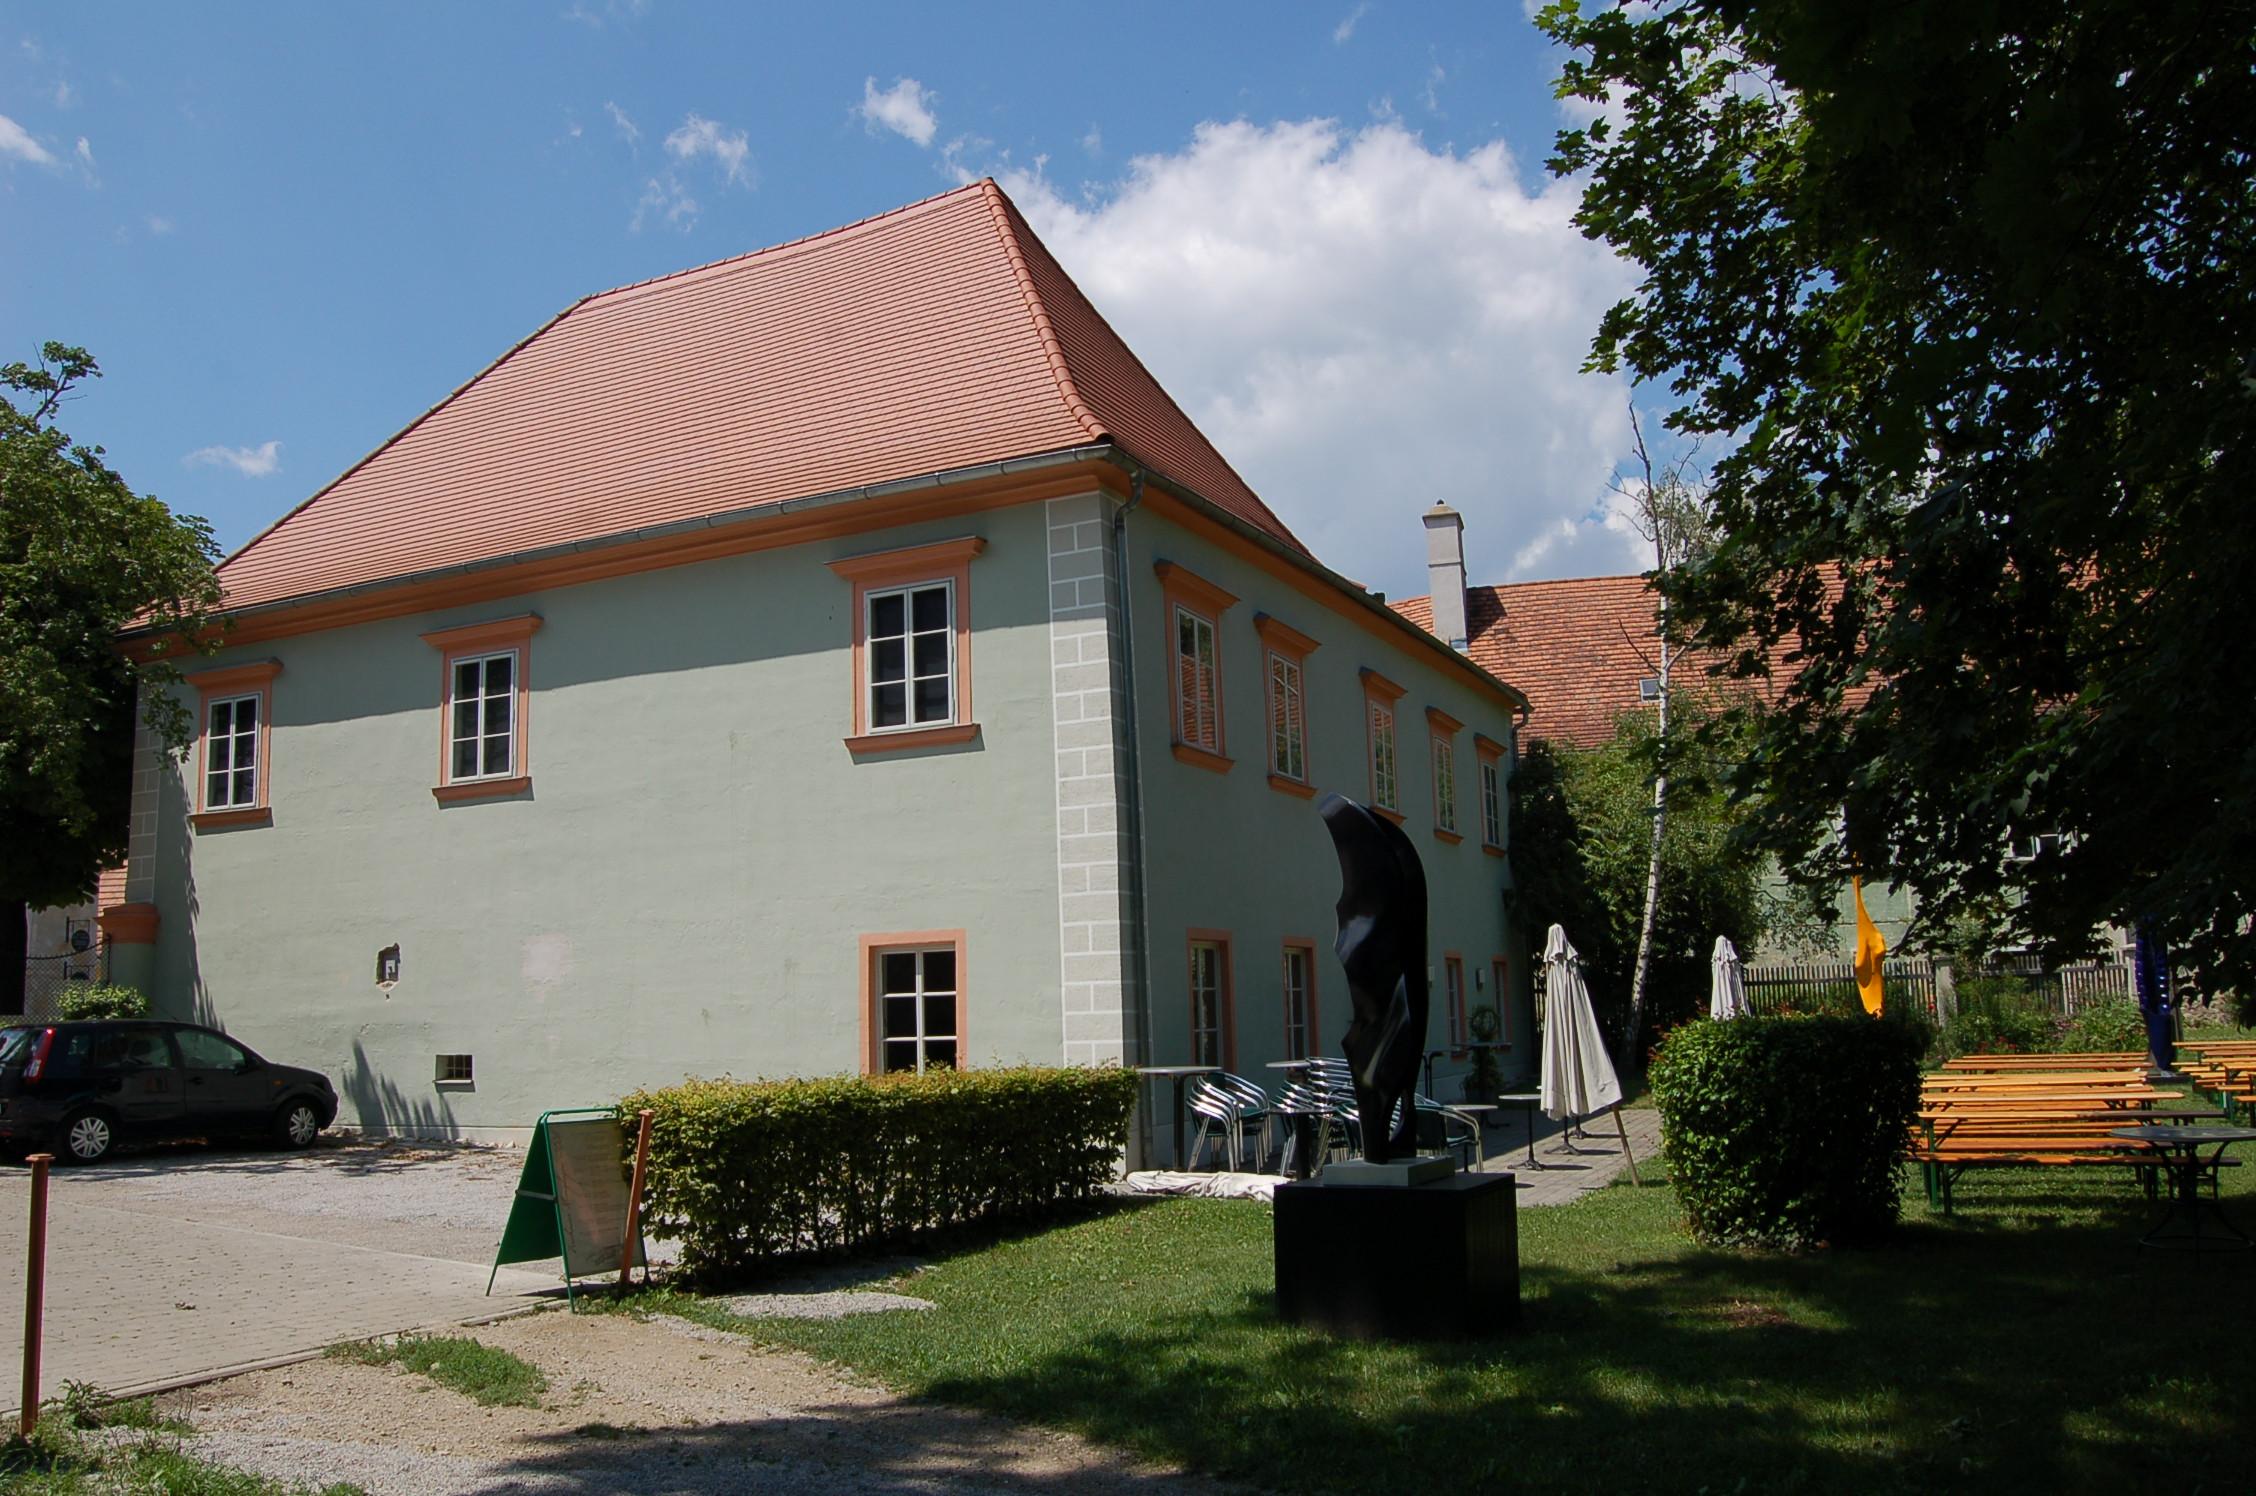 Weiberball in Wopfing - Save the Date! - SP Bad Fischau